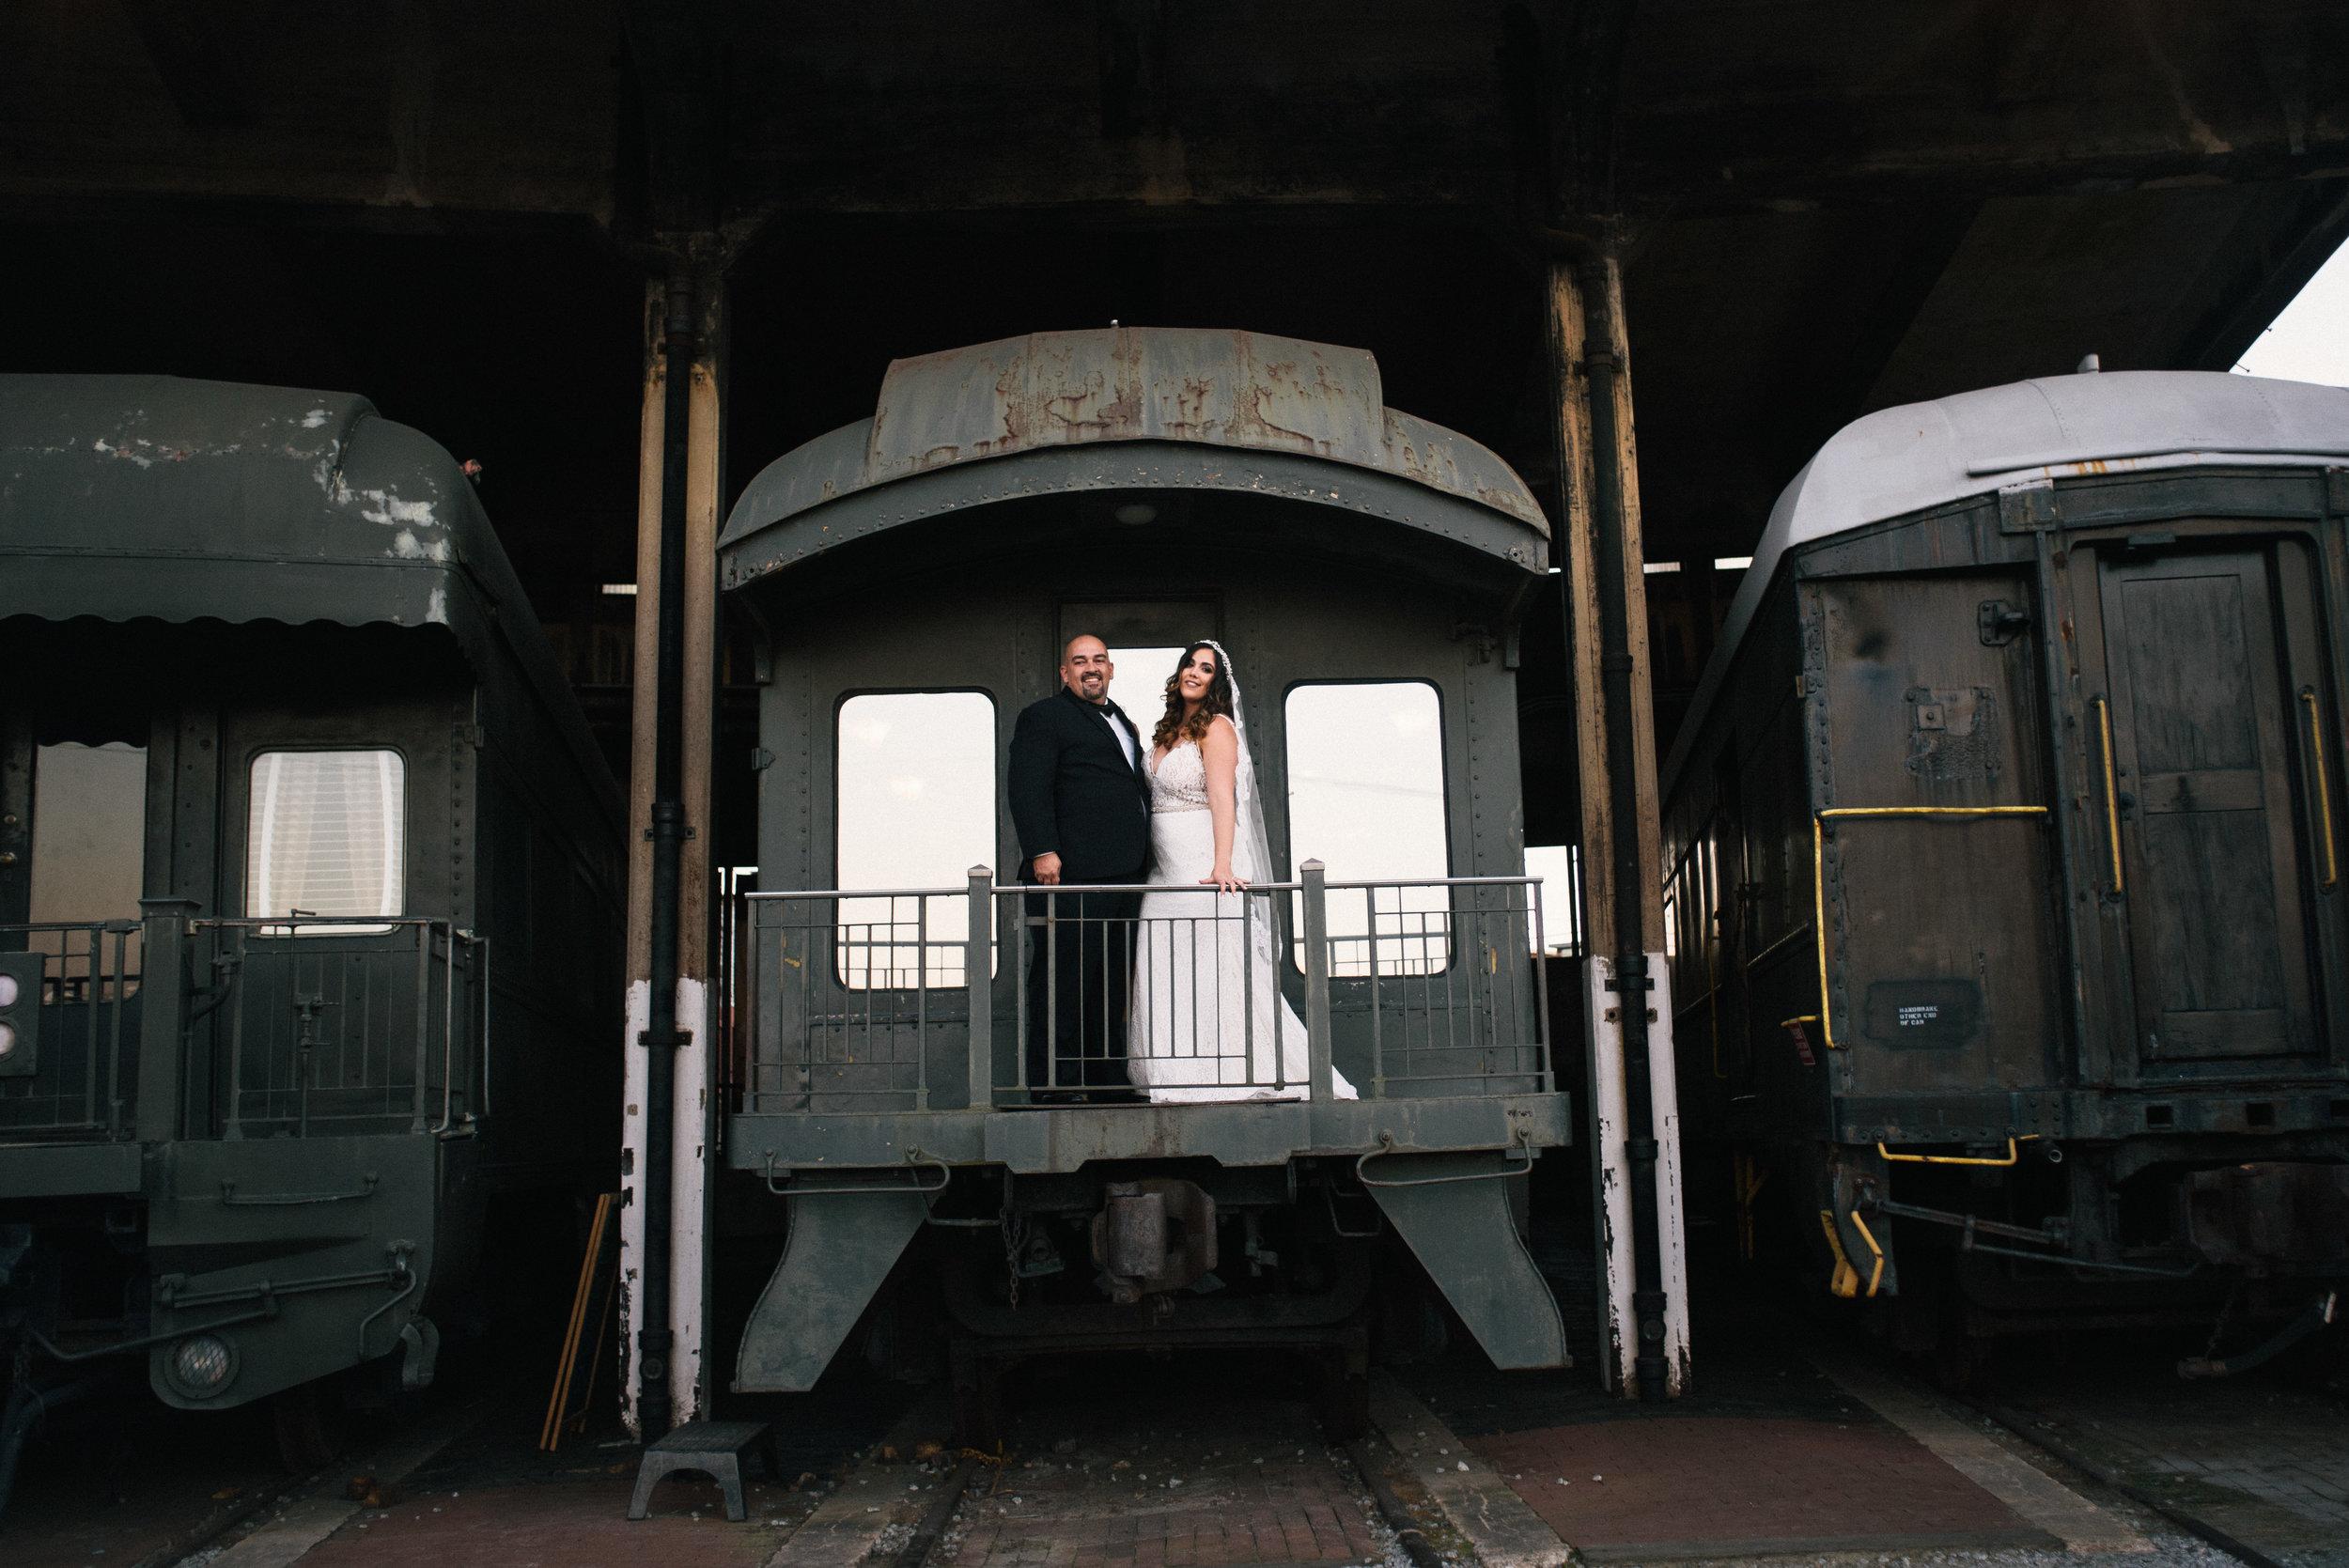 Iggy-and-yesenia-savannah-railroad-museum-wedding-meg-hill-photo- (757 of 1037).jpg